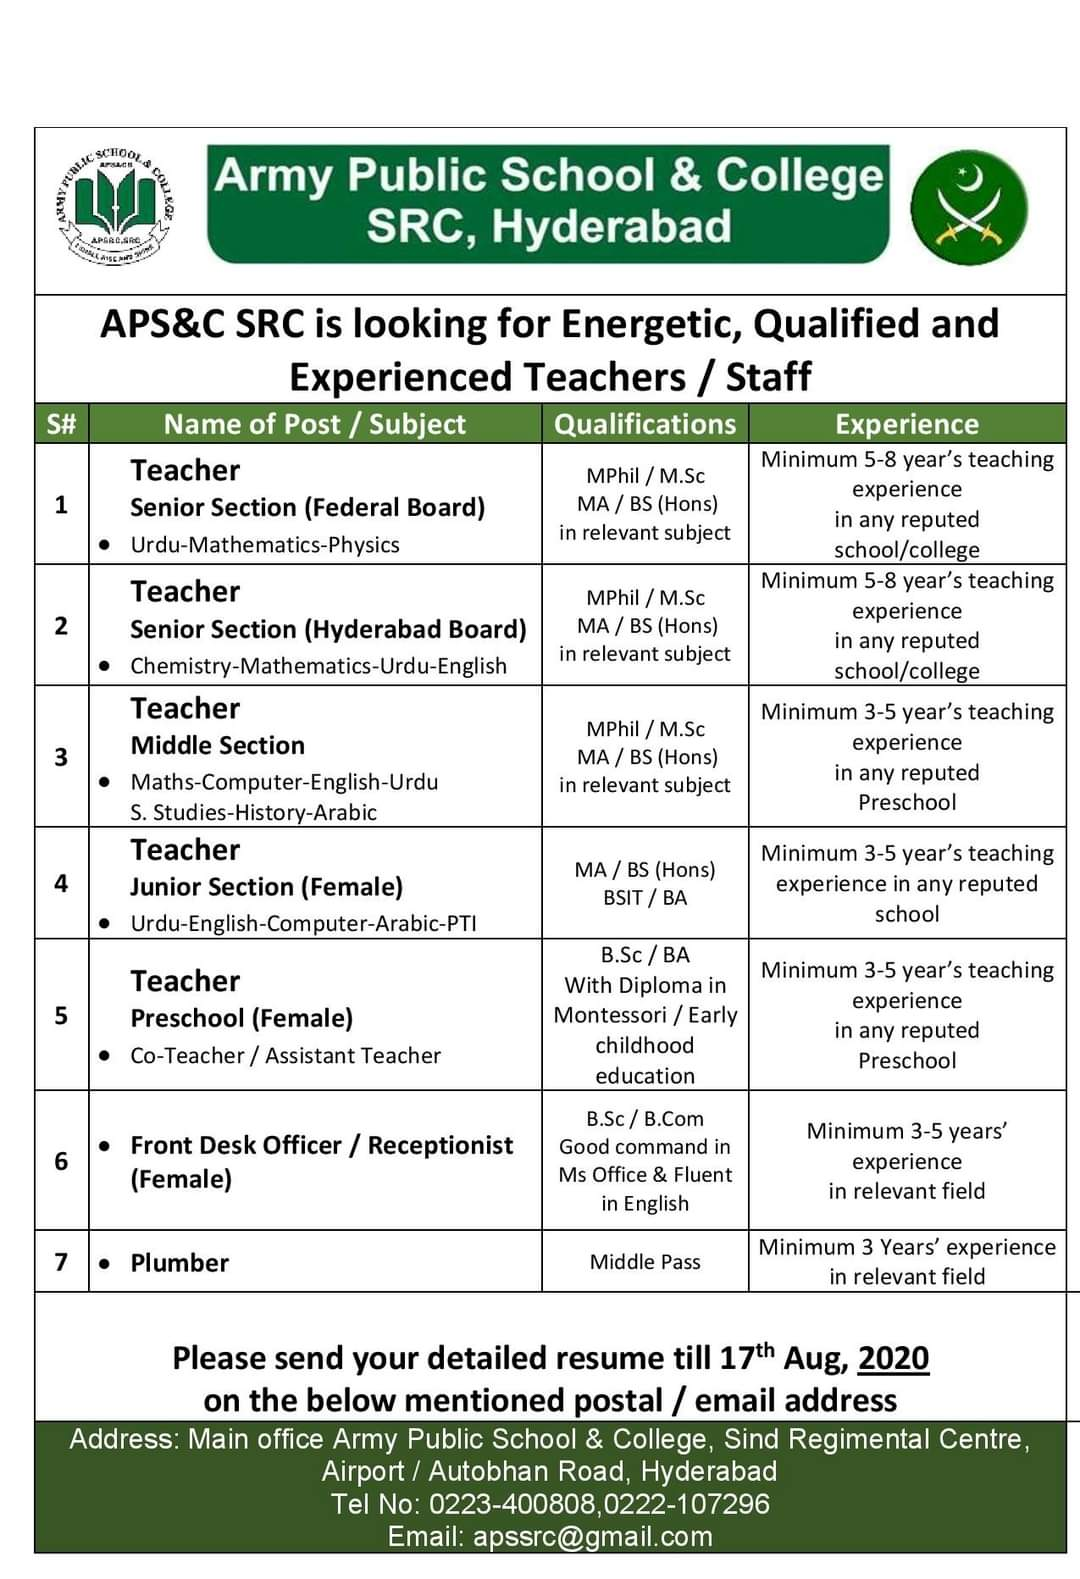 Army Public School & College SRC Hyderabad Jobs 2020 | Teaching Jobs